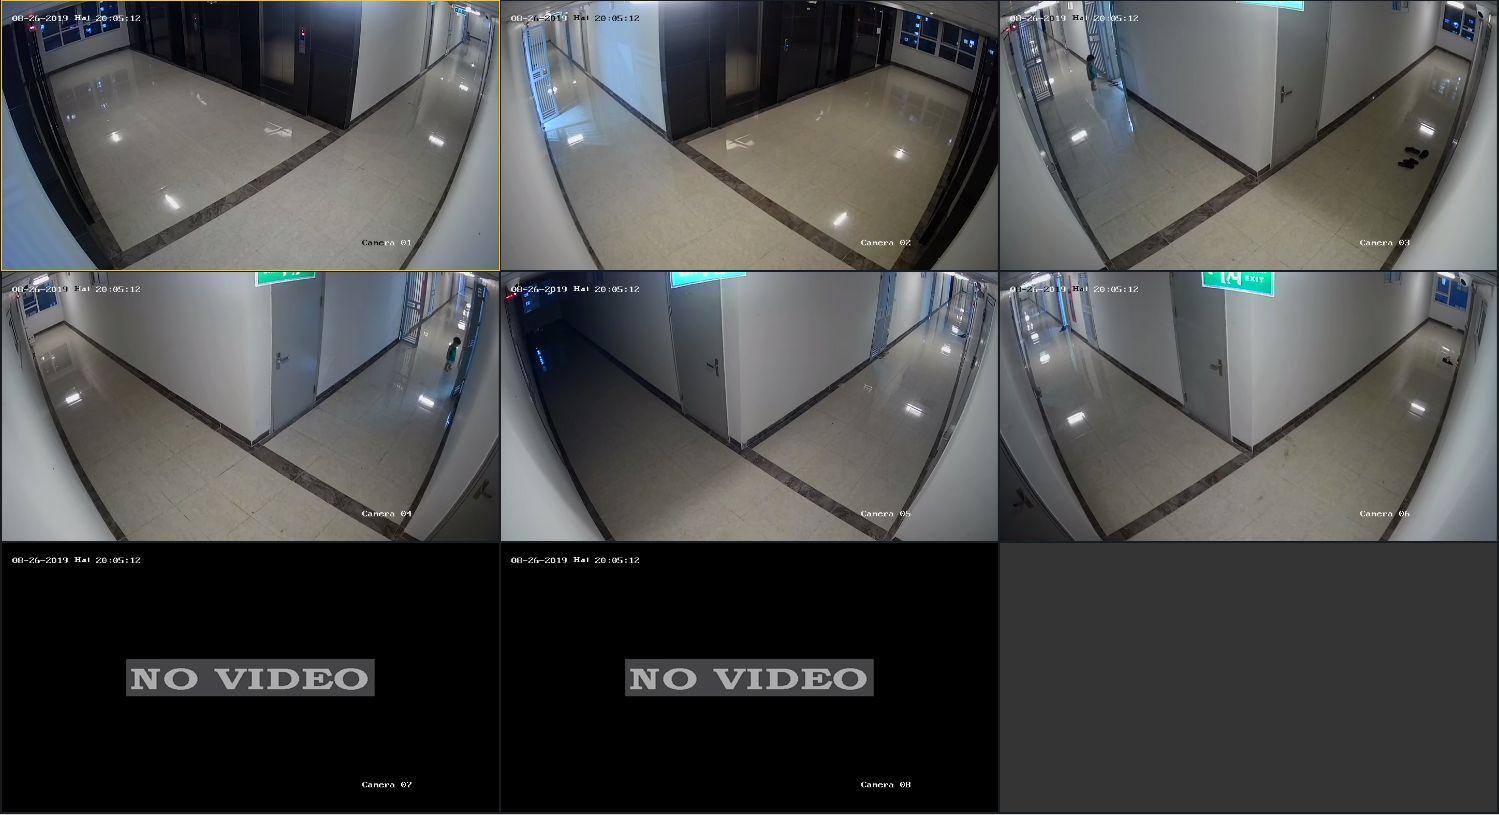 6 camera